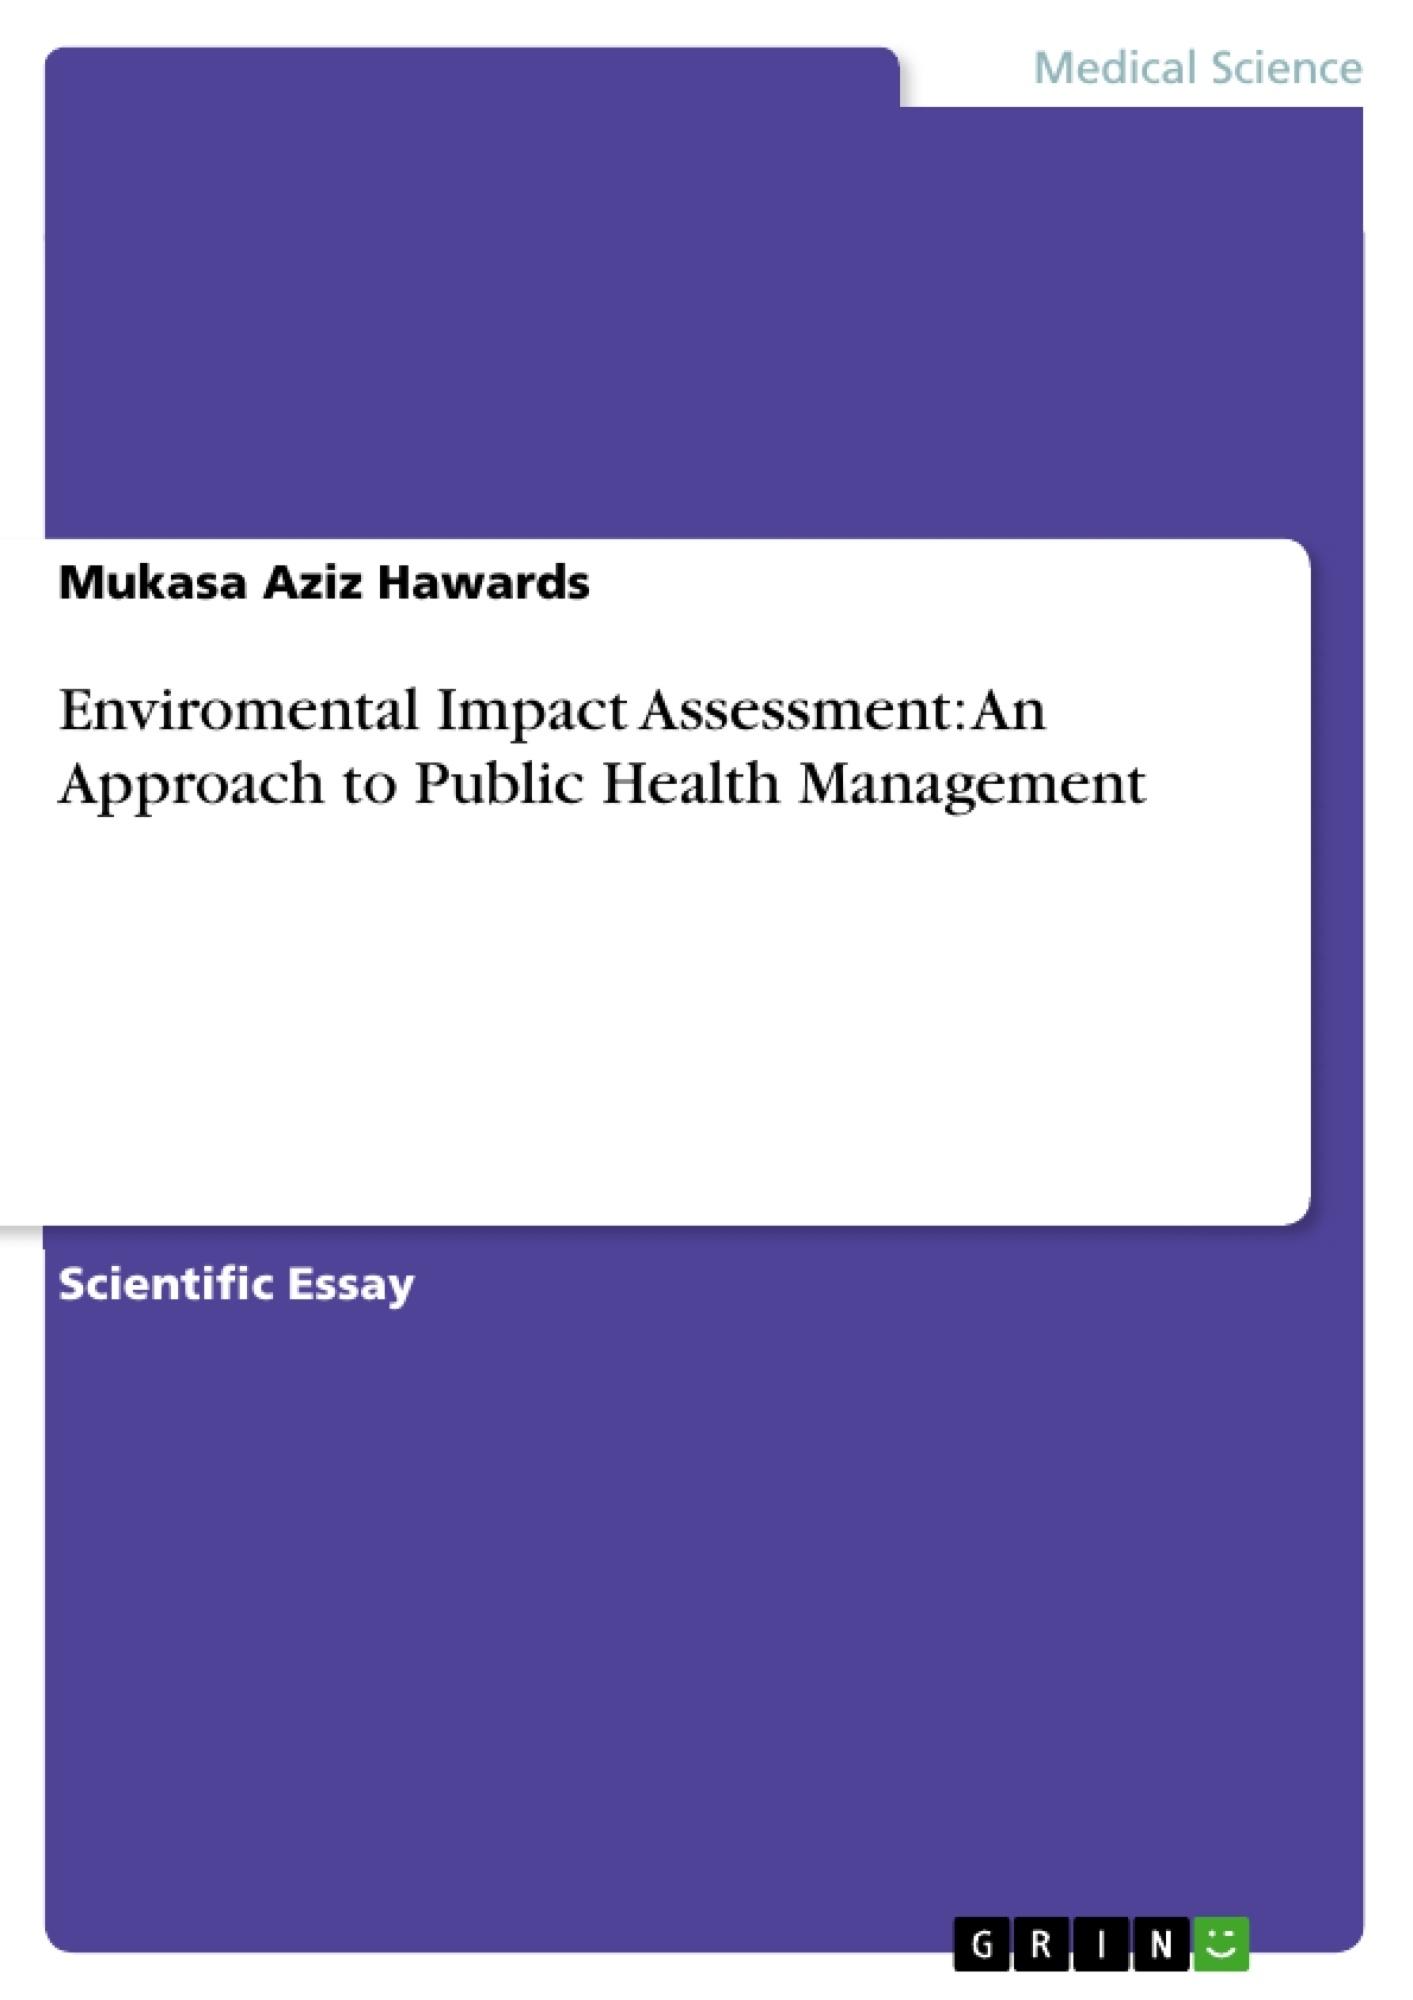 Title: Enviromental Impact Assessment: An Approach to Public Health Management